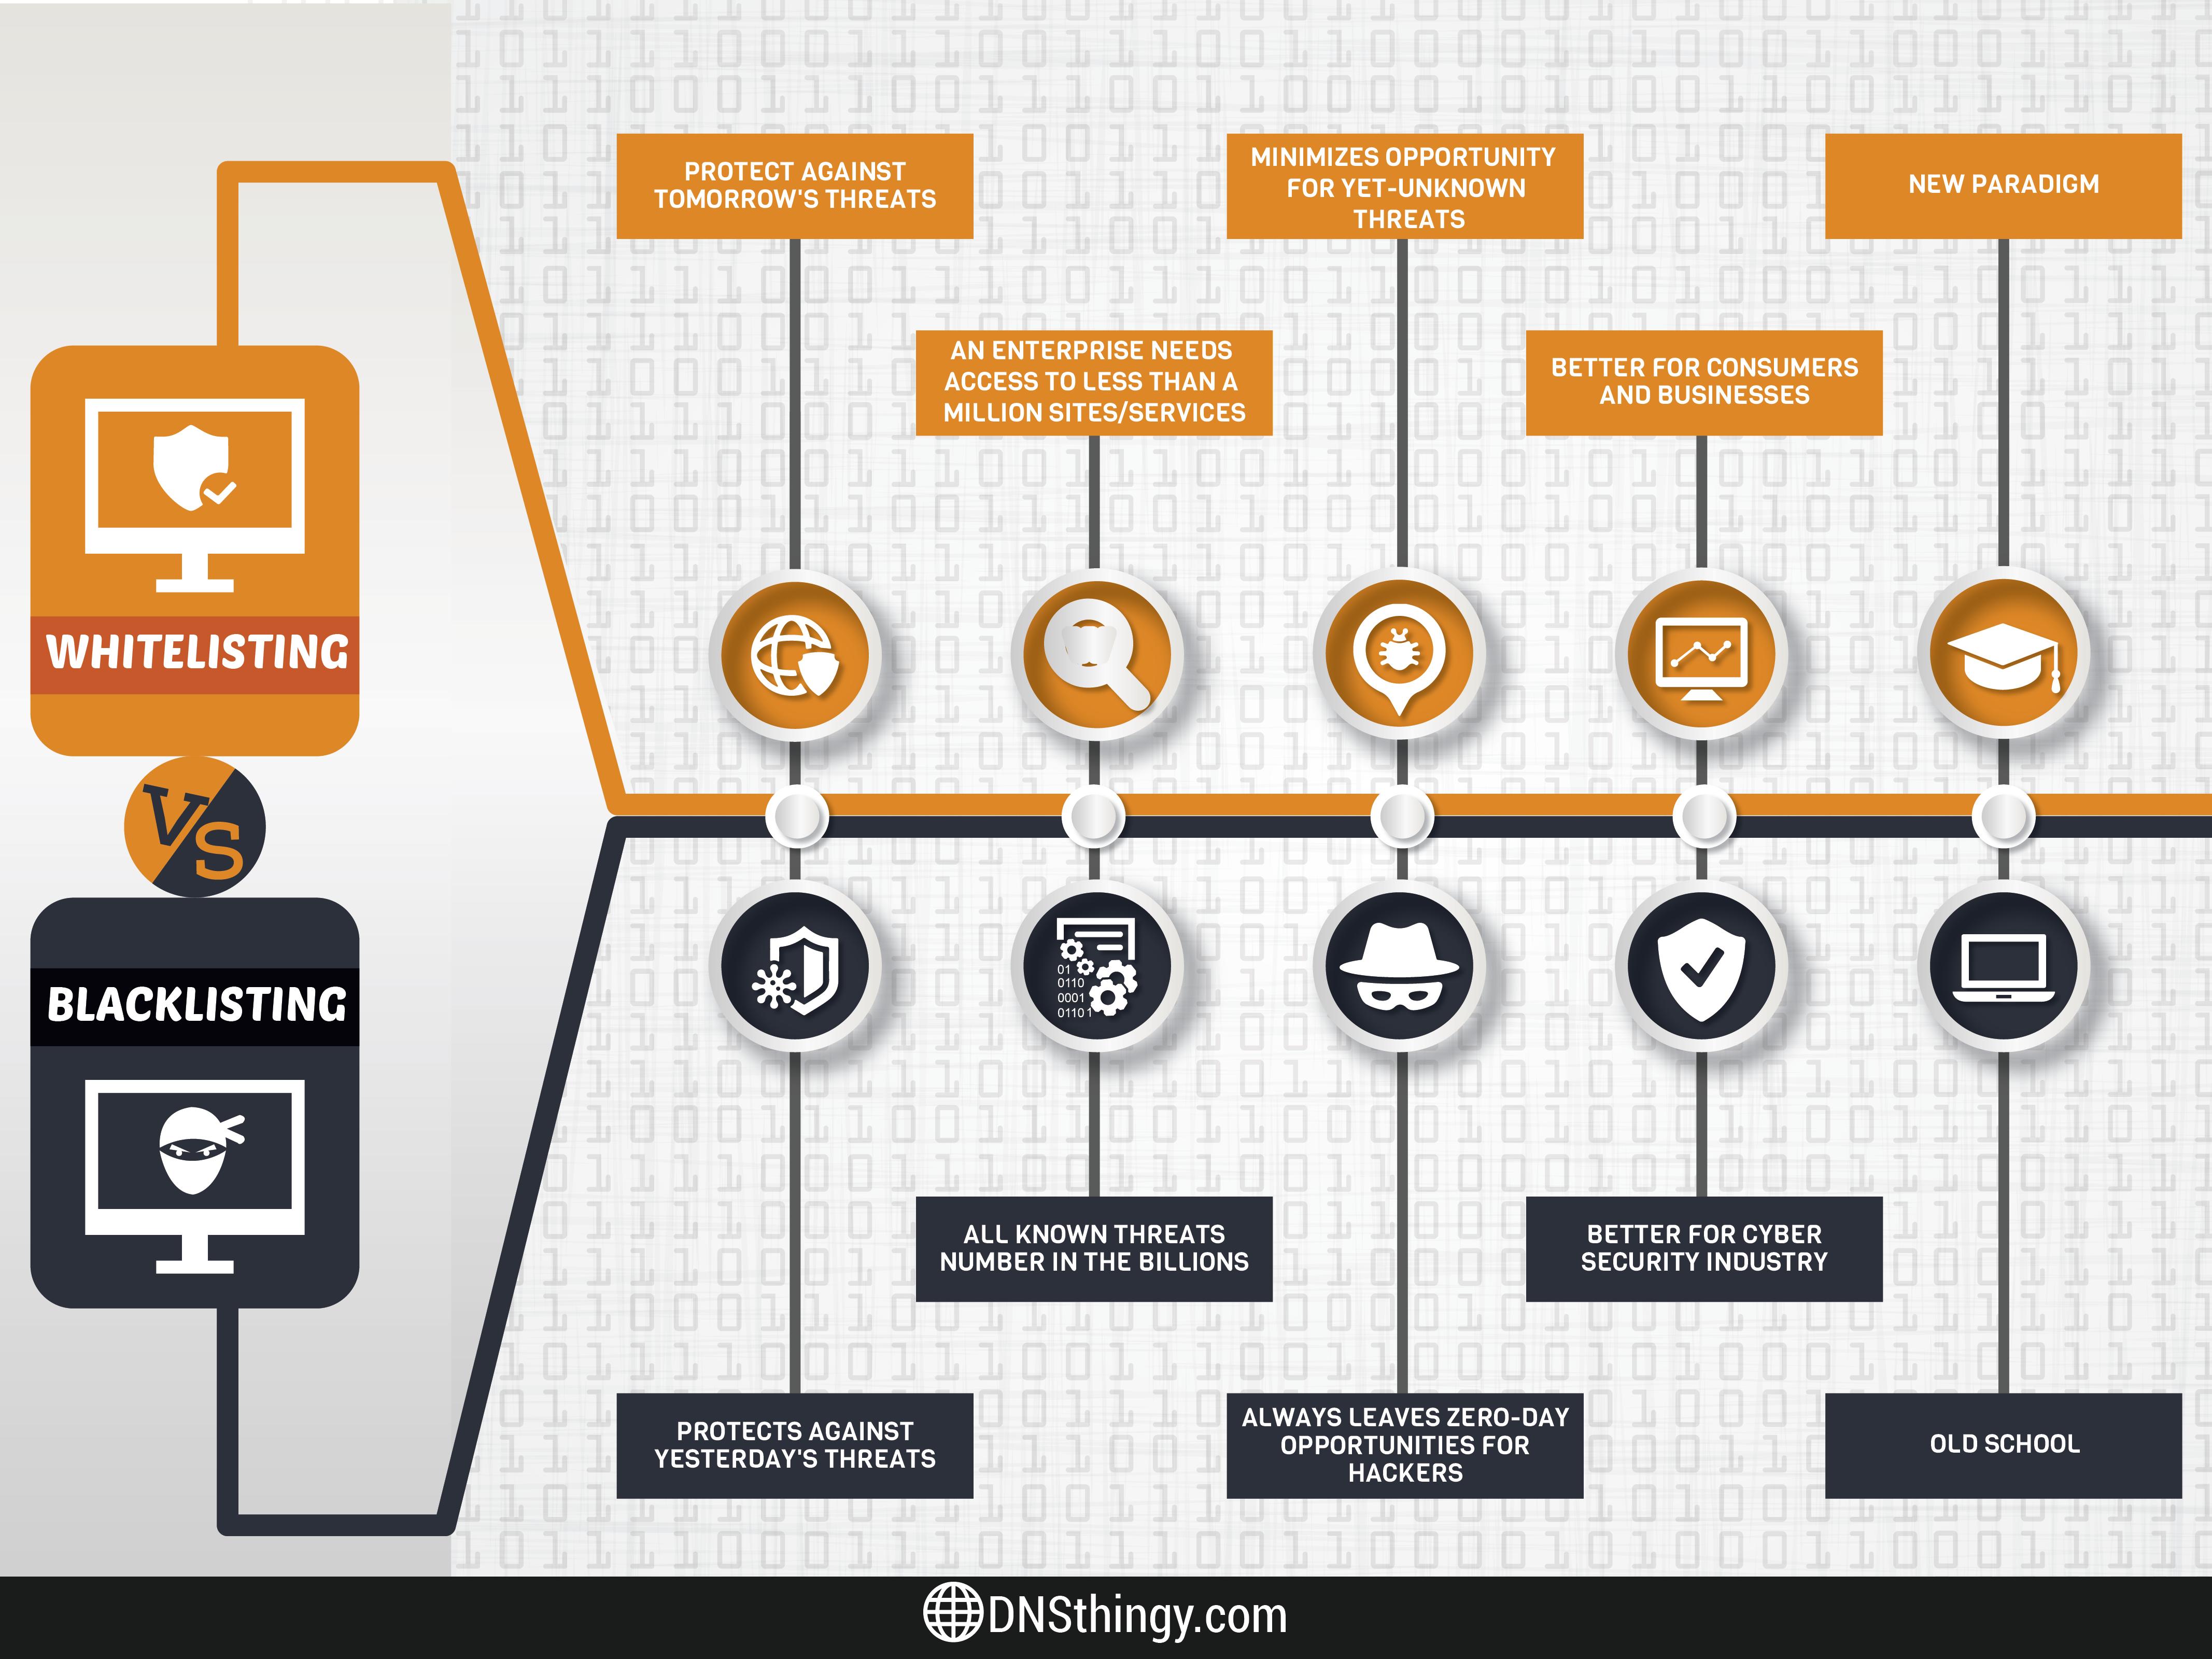 whitelisting-blacklisting-infographic